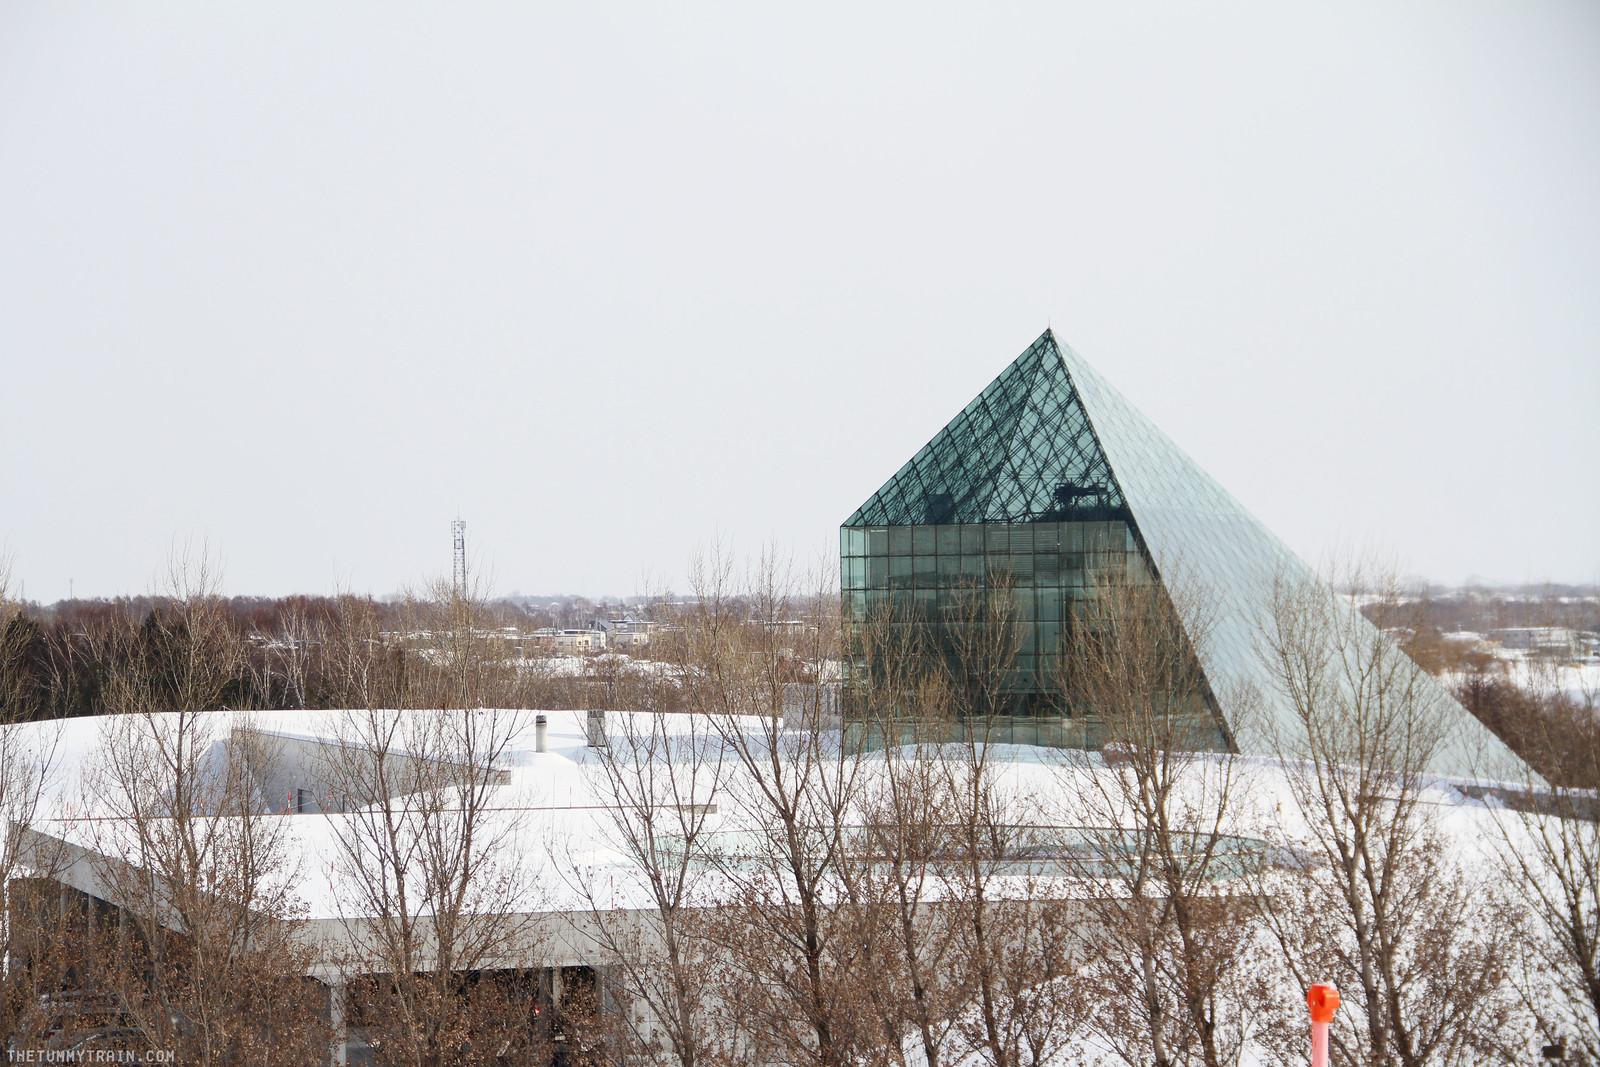 32916221635 f27c2fd5d9 h - Sapporo Snow And Smile: 8 Unforgettable Winter Experiences in Sapporo City